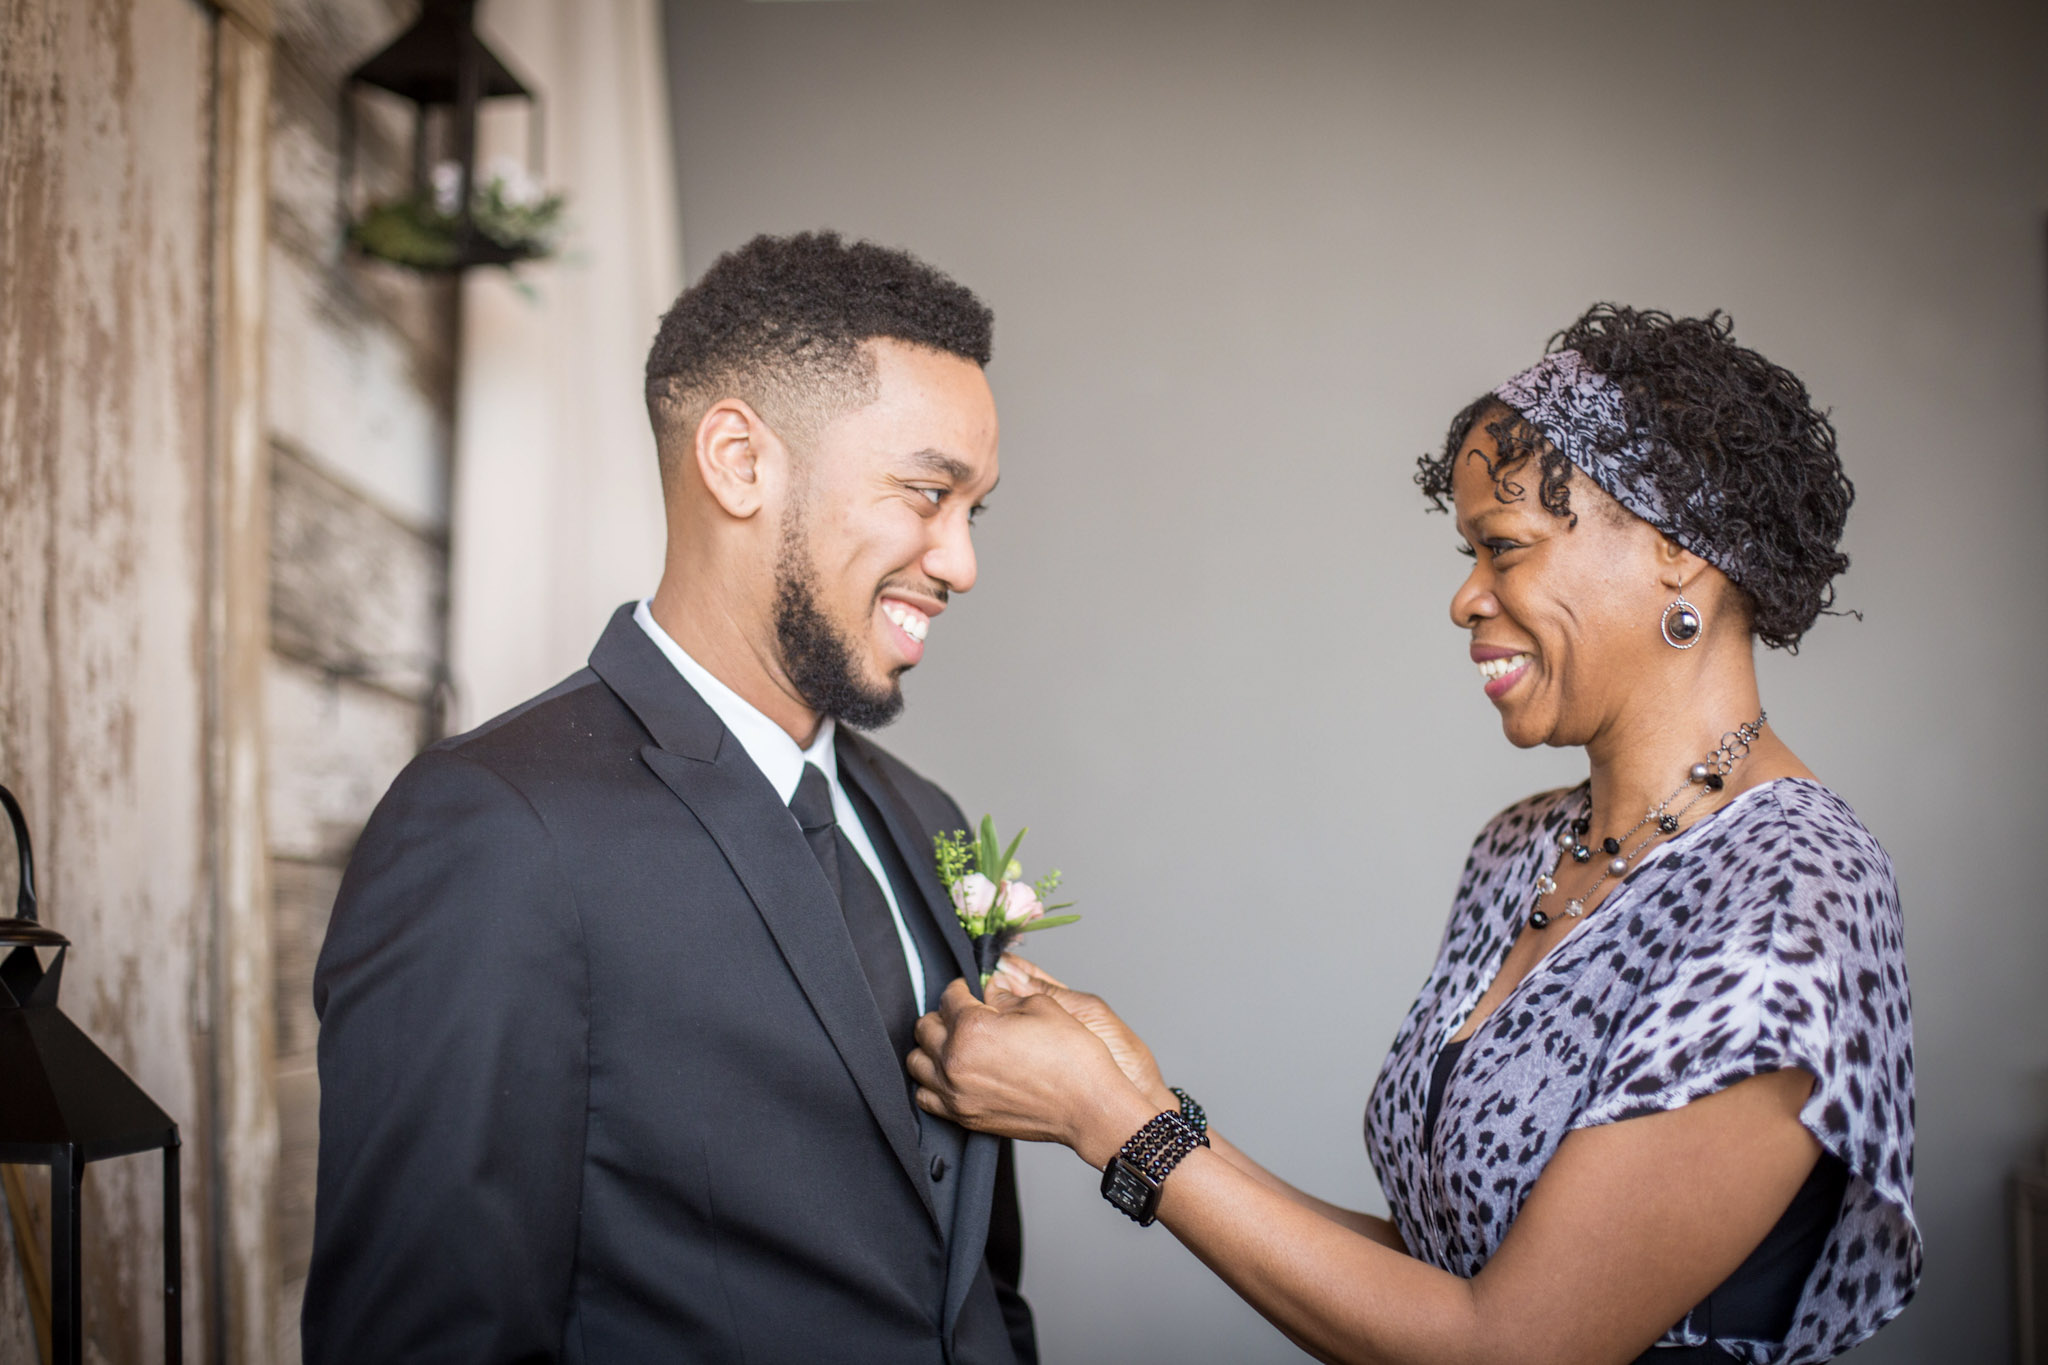 Kansas+City-Small+Wedding-Elope_Intimate_Ceremony_Mother's+Day_1.jpg